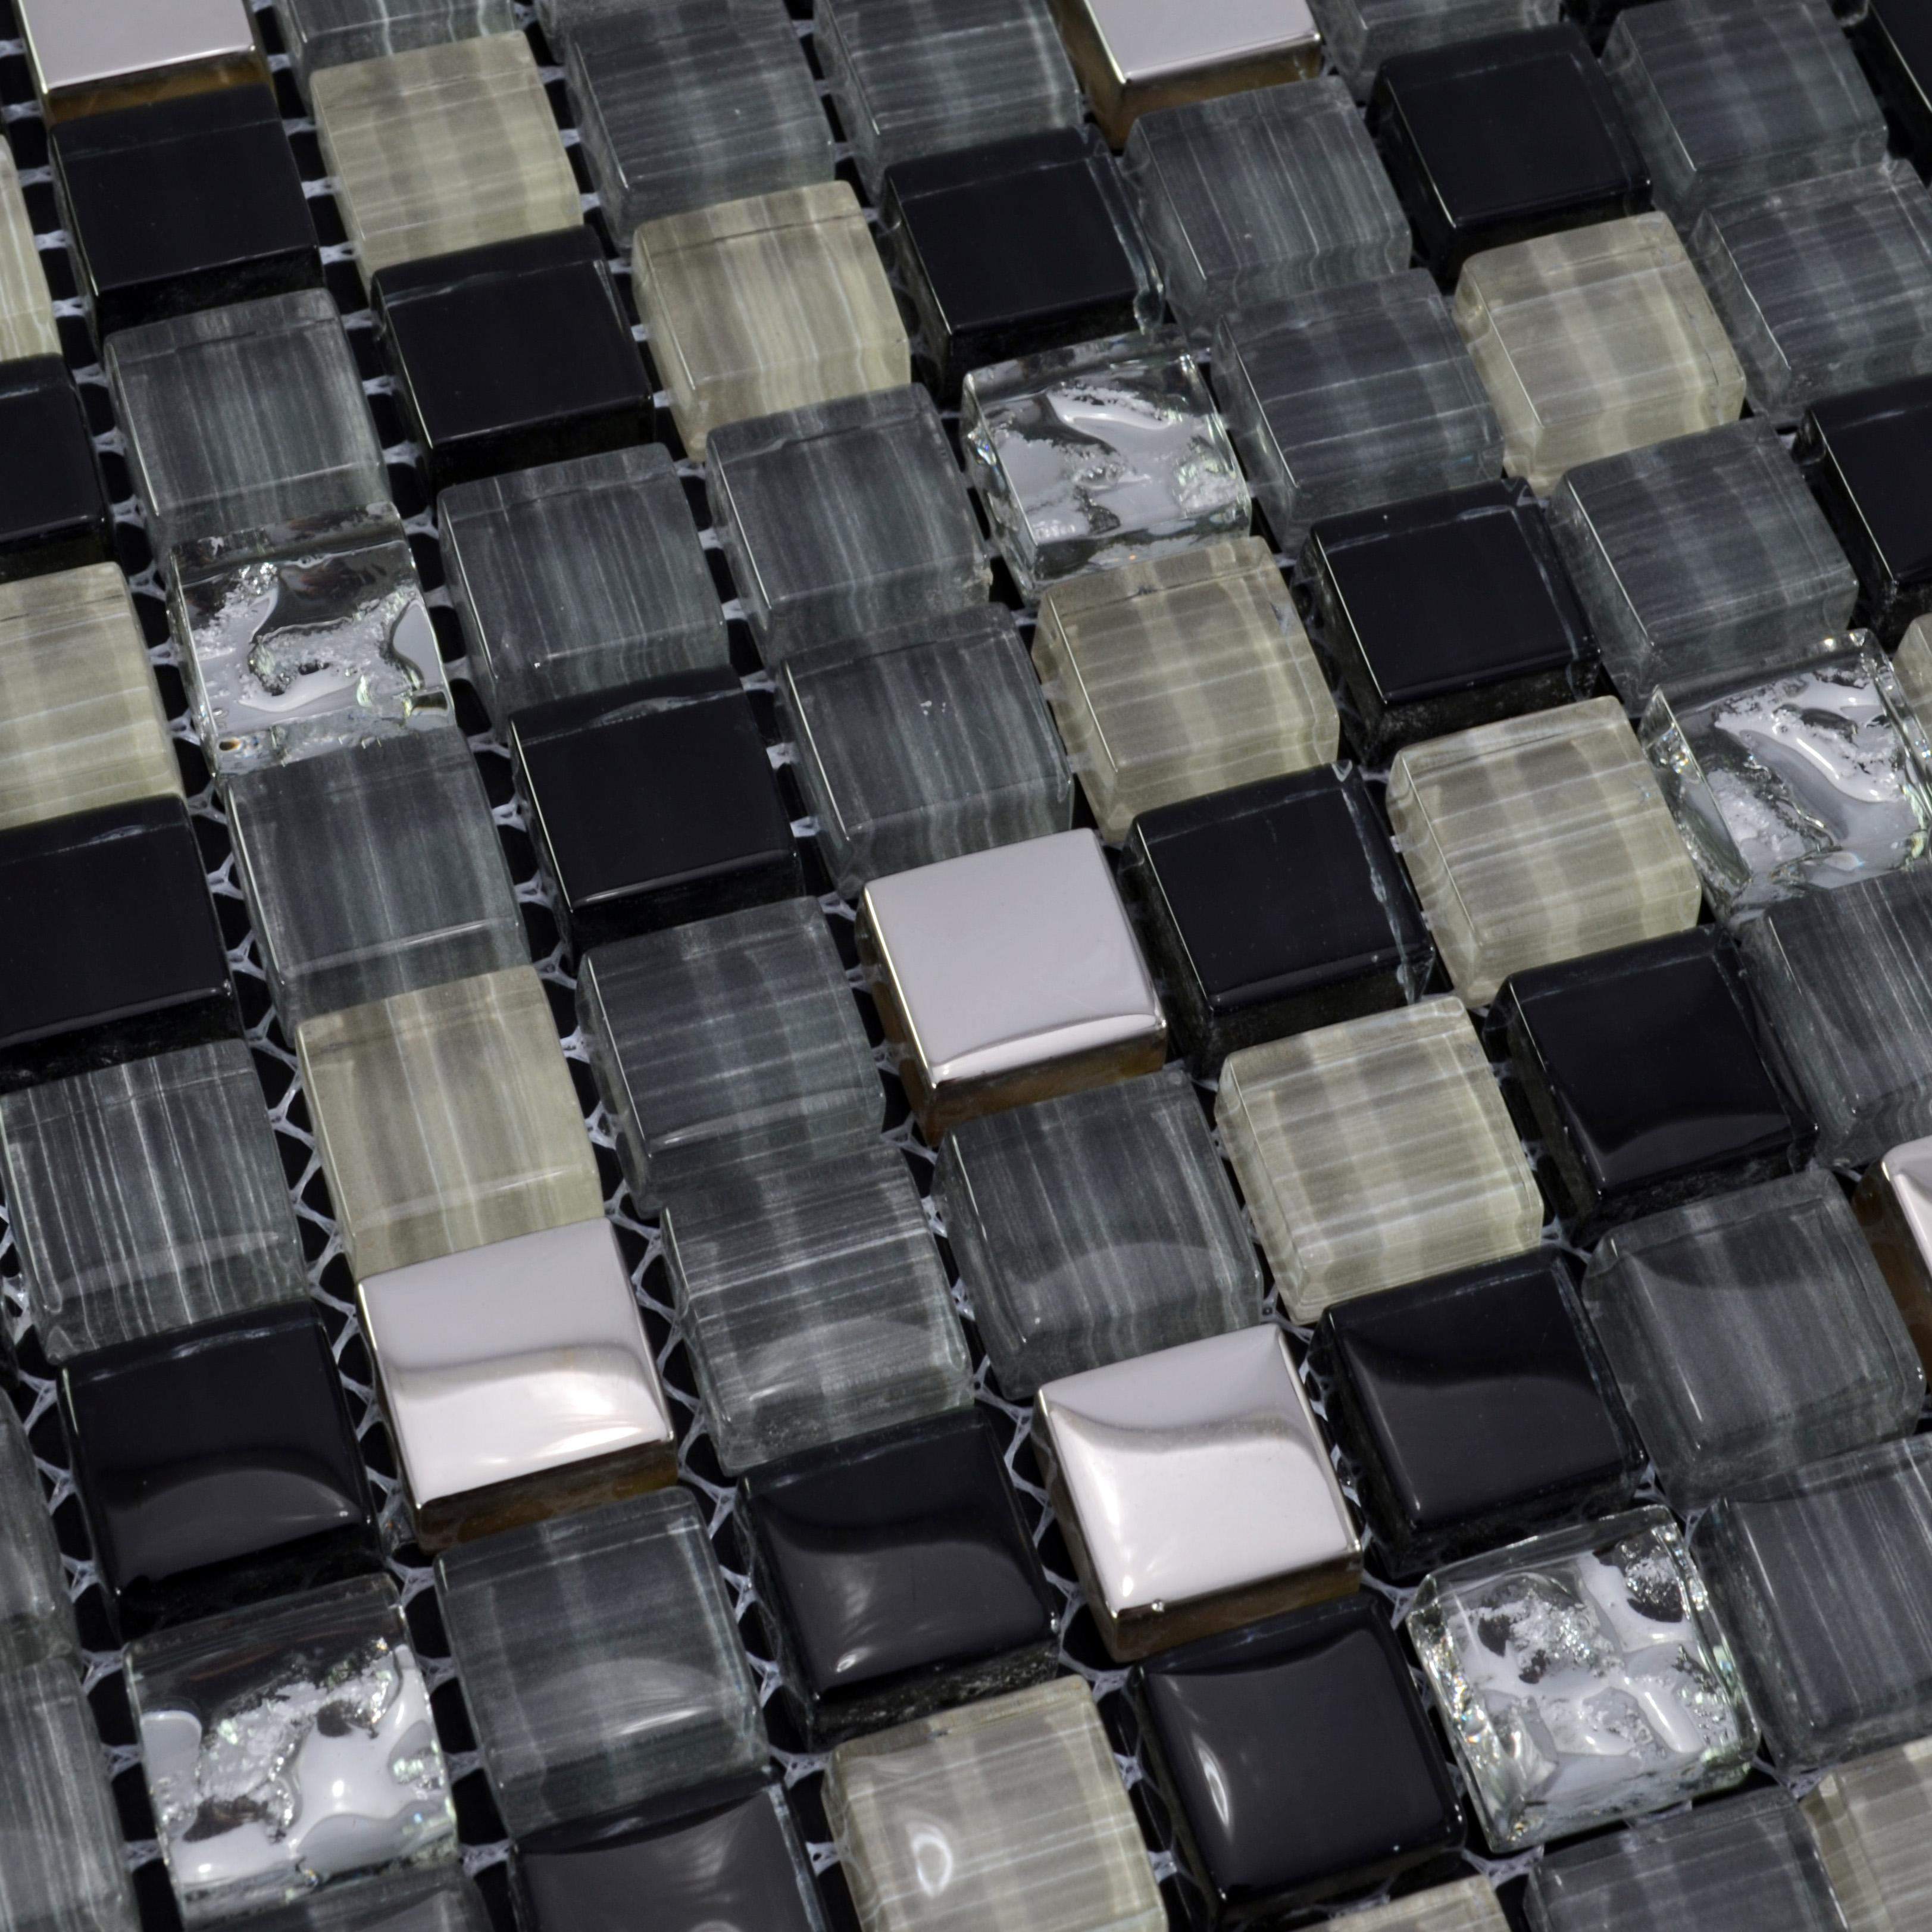 glass tiles for backsplashes bathrooms and pools bravotti com hand painted tiles crystal glass tile sheets square kitchen backsplash wall tile executive metal coating mosaic